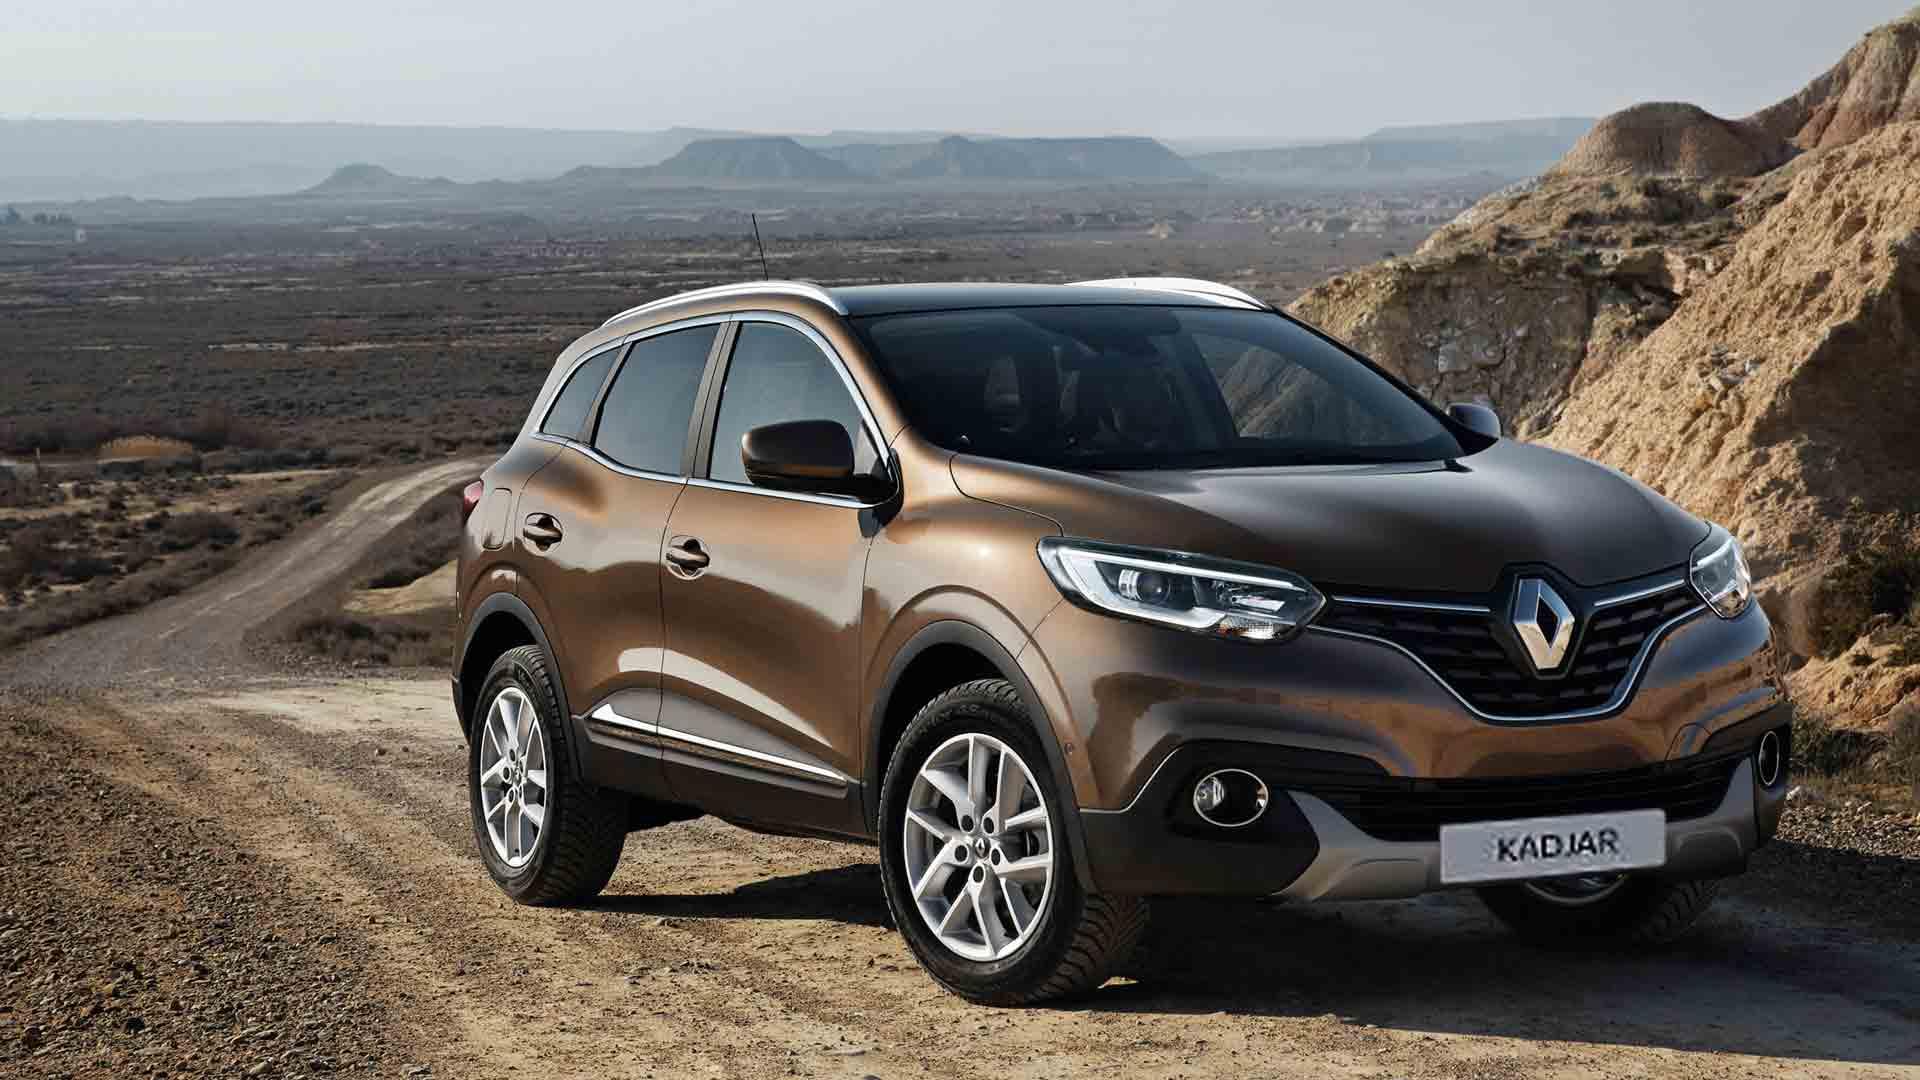 Renault kadjar renault maintenon for Interieur kadjar